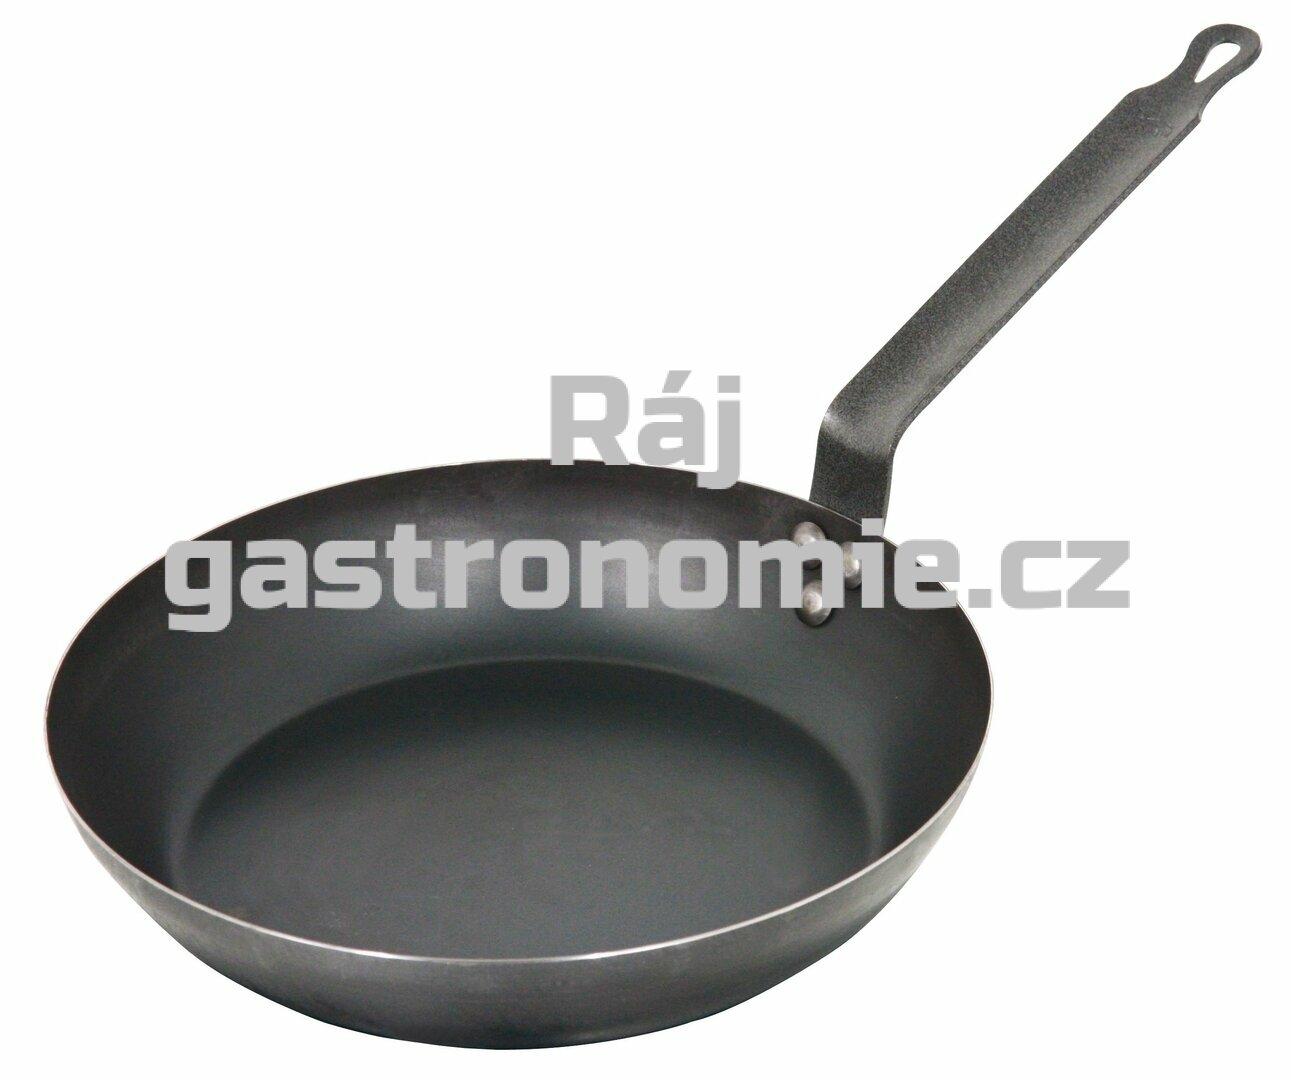 Pánev (Ø280 mm, hmotnost 0,95kg)